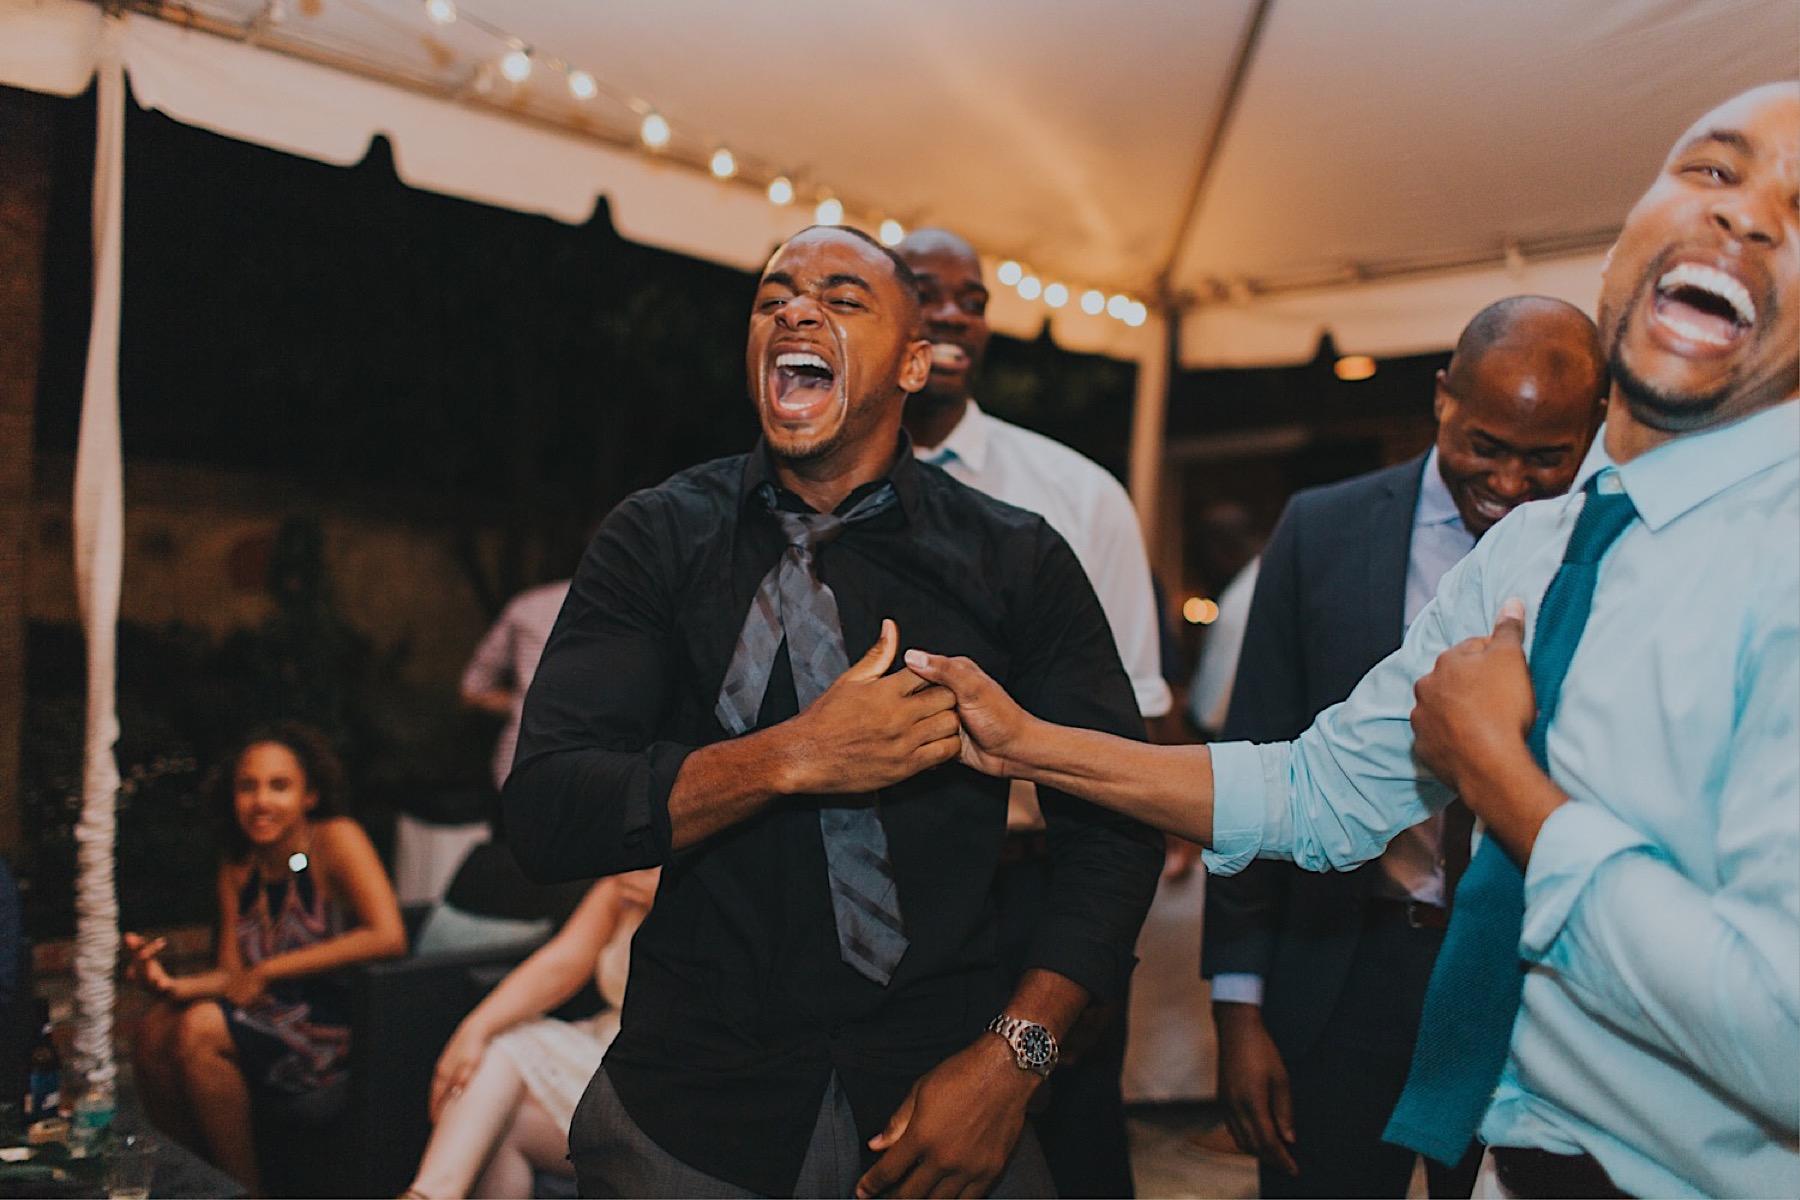 summer french quarter wedding, french quarter wedding in the summer, nola summer wedding, summer wedding in nola, new orleans summer wedding, summer wedding in new orleans, Hermann-Grima House wedding, wedding at Hermann-Grima House, wedding at Broussard's, Broussard's wedding, nola wedding ideas, wedding ideas in nola, fun nola wedding ideas, new orleans wedding ideas, wedding ideas in new orleans, french quarter wedding ideas, wedding ideas in the french quarter